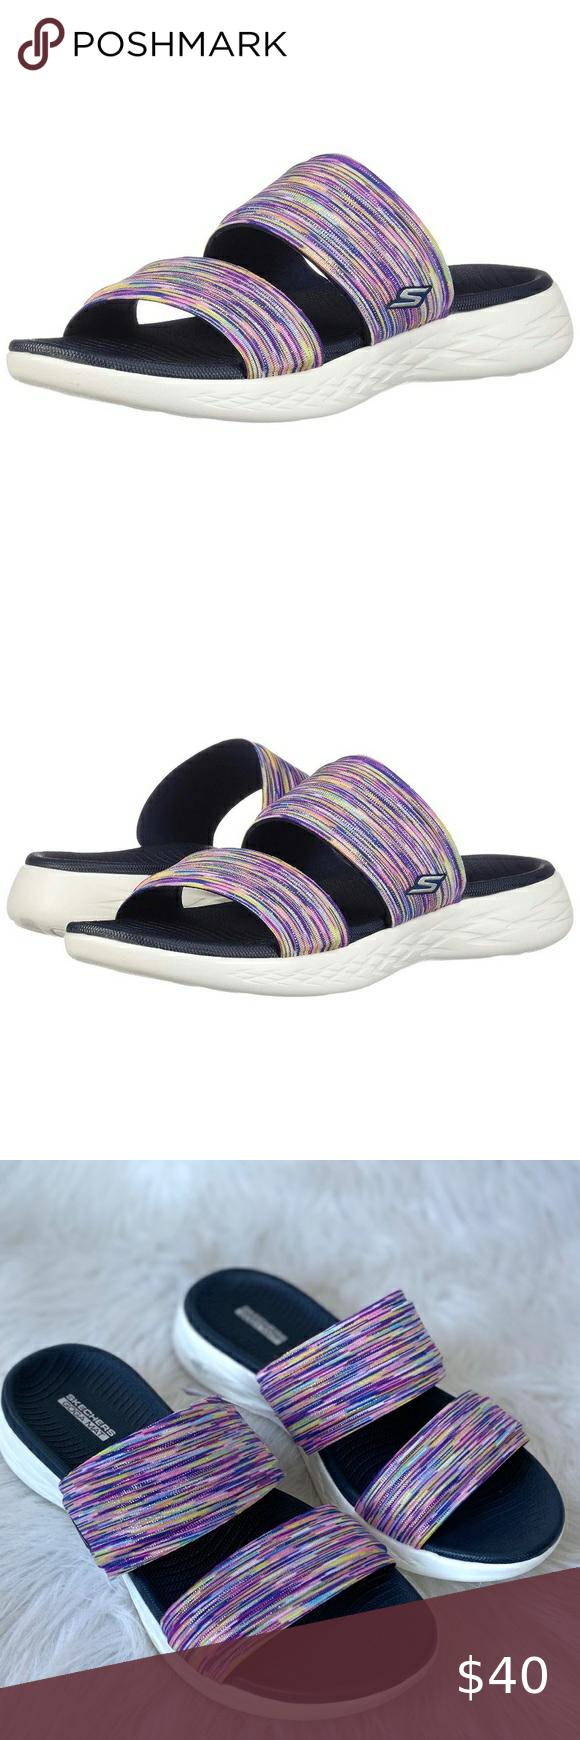 💖 NEW Skechers Goga Mat Slides Sandals